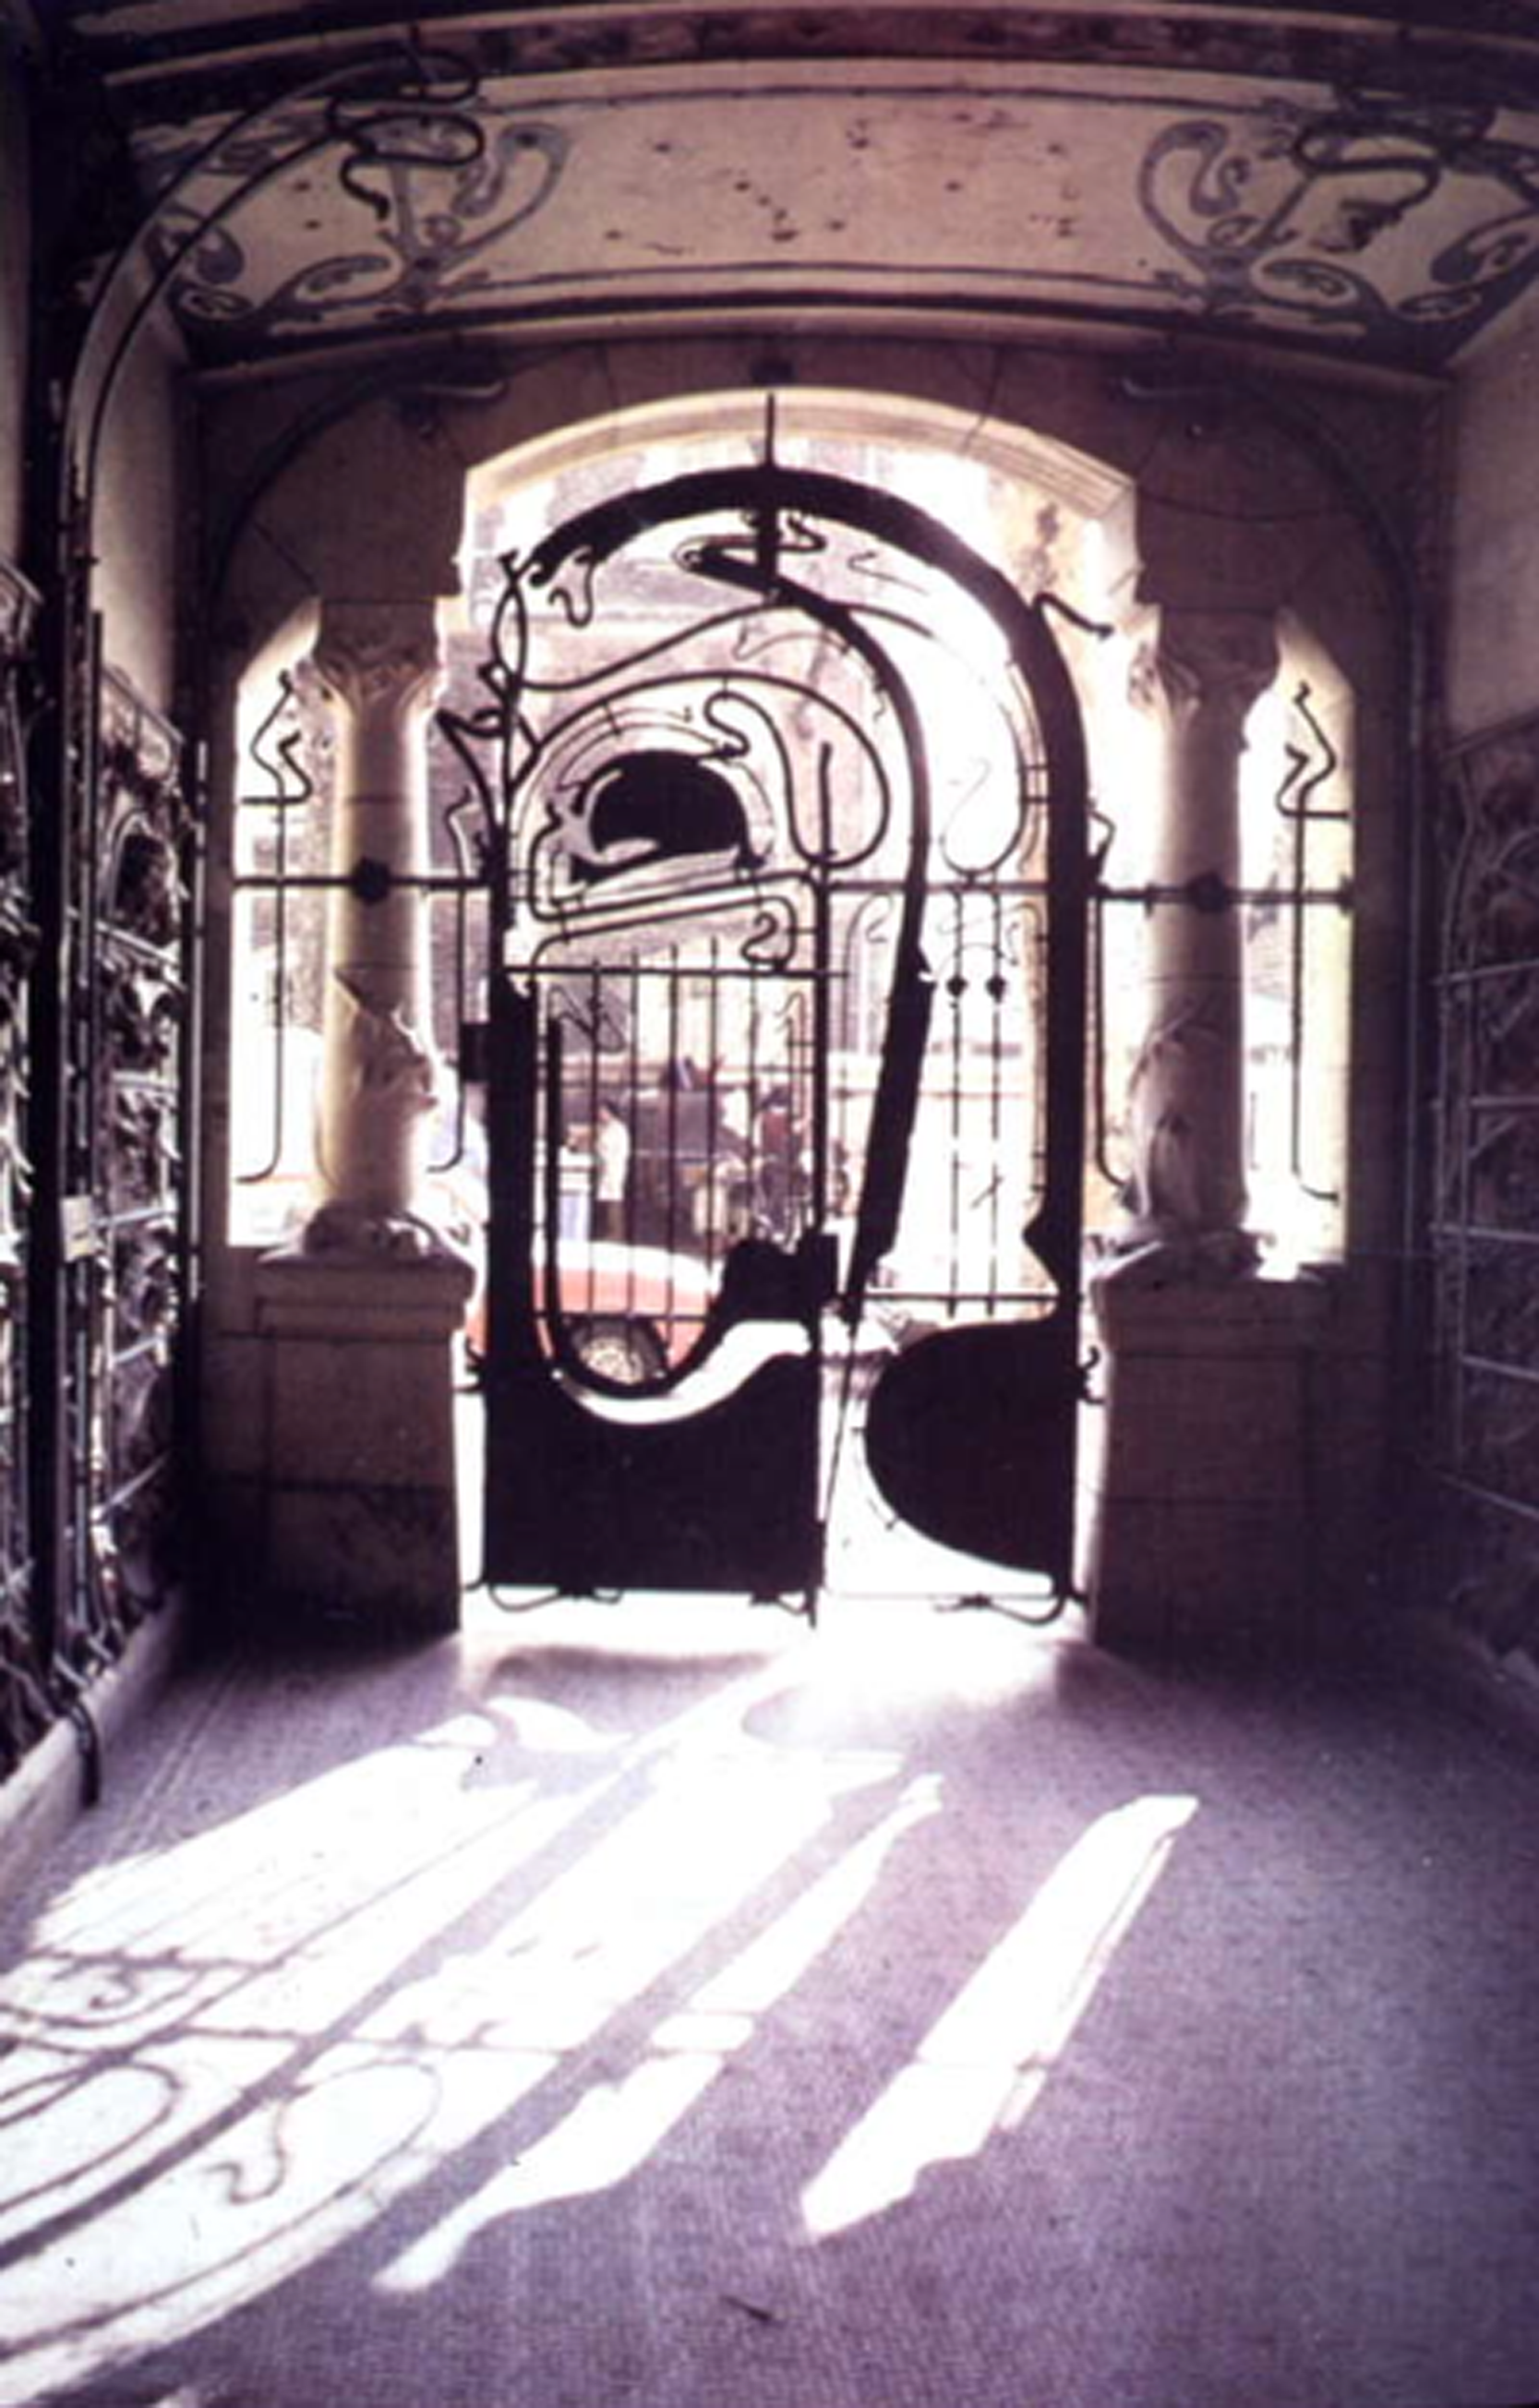 Hector Guimard Art Nouveau Modernismo